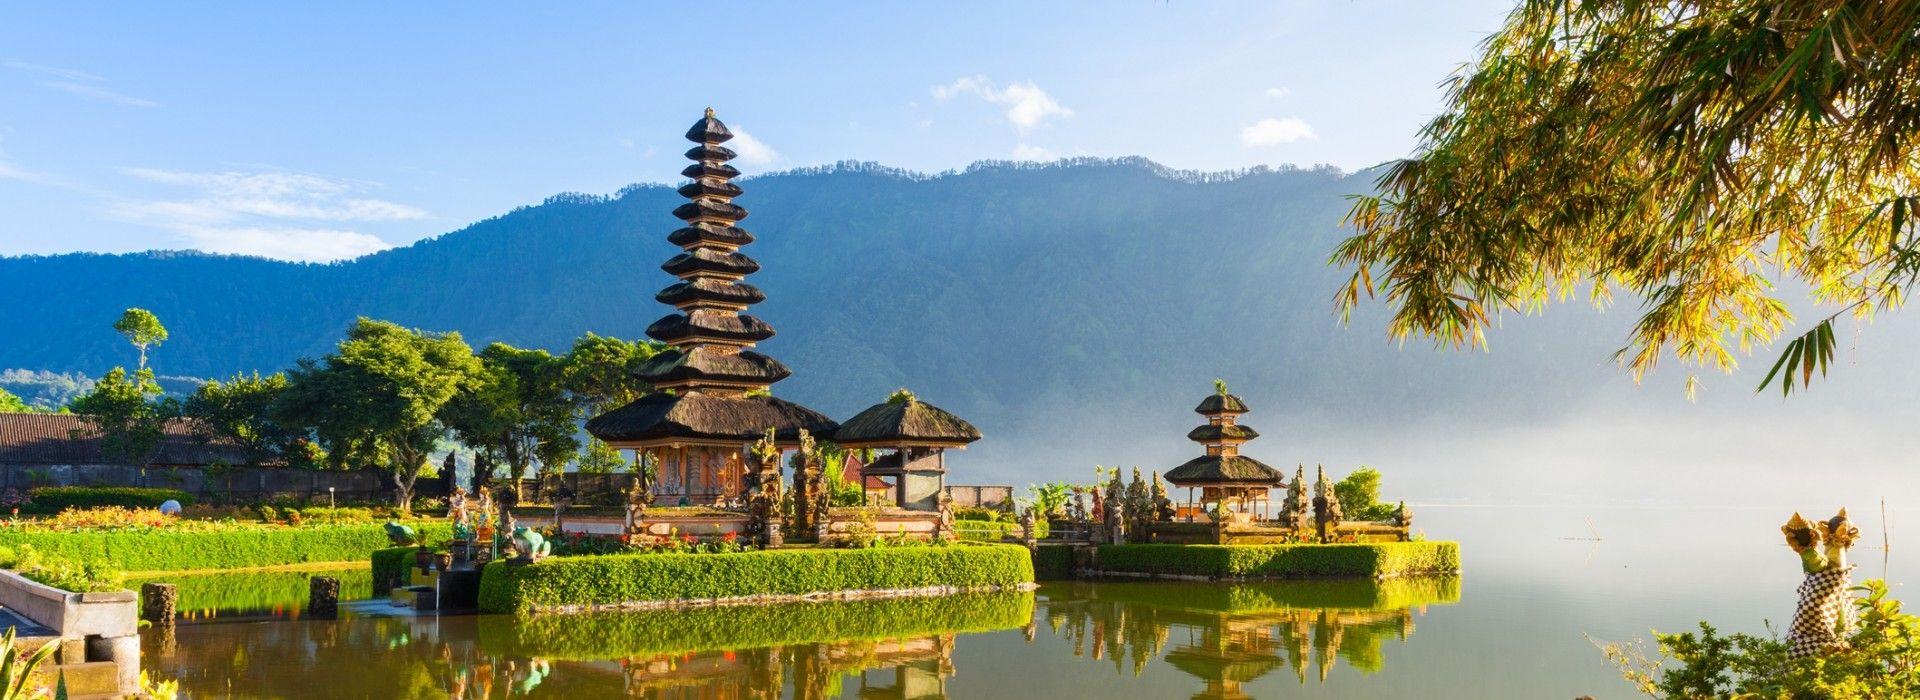 Getaways and short breaks Tours in Bali